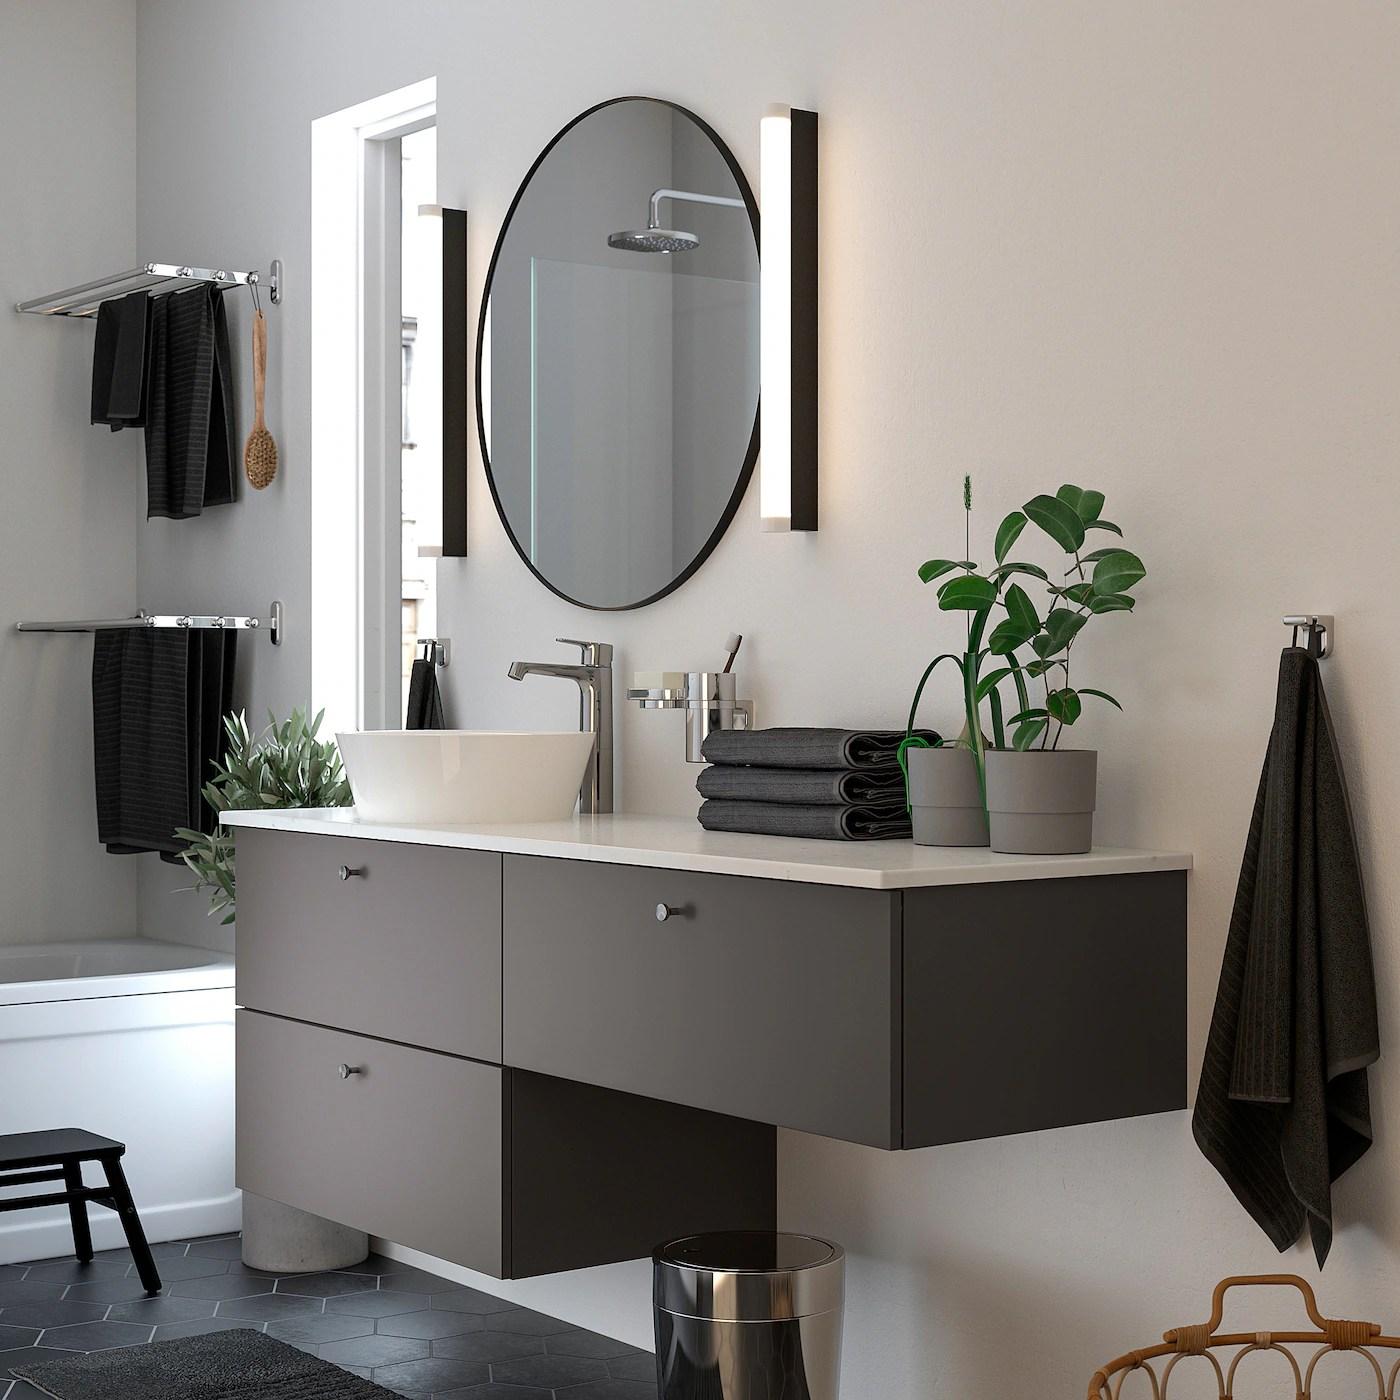 godmorgon tolken kattevik mobilier salle de bain 6 pieces gillburen gris fonce marbre mitigeur lavabo brogrund 162x49x75 cm